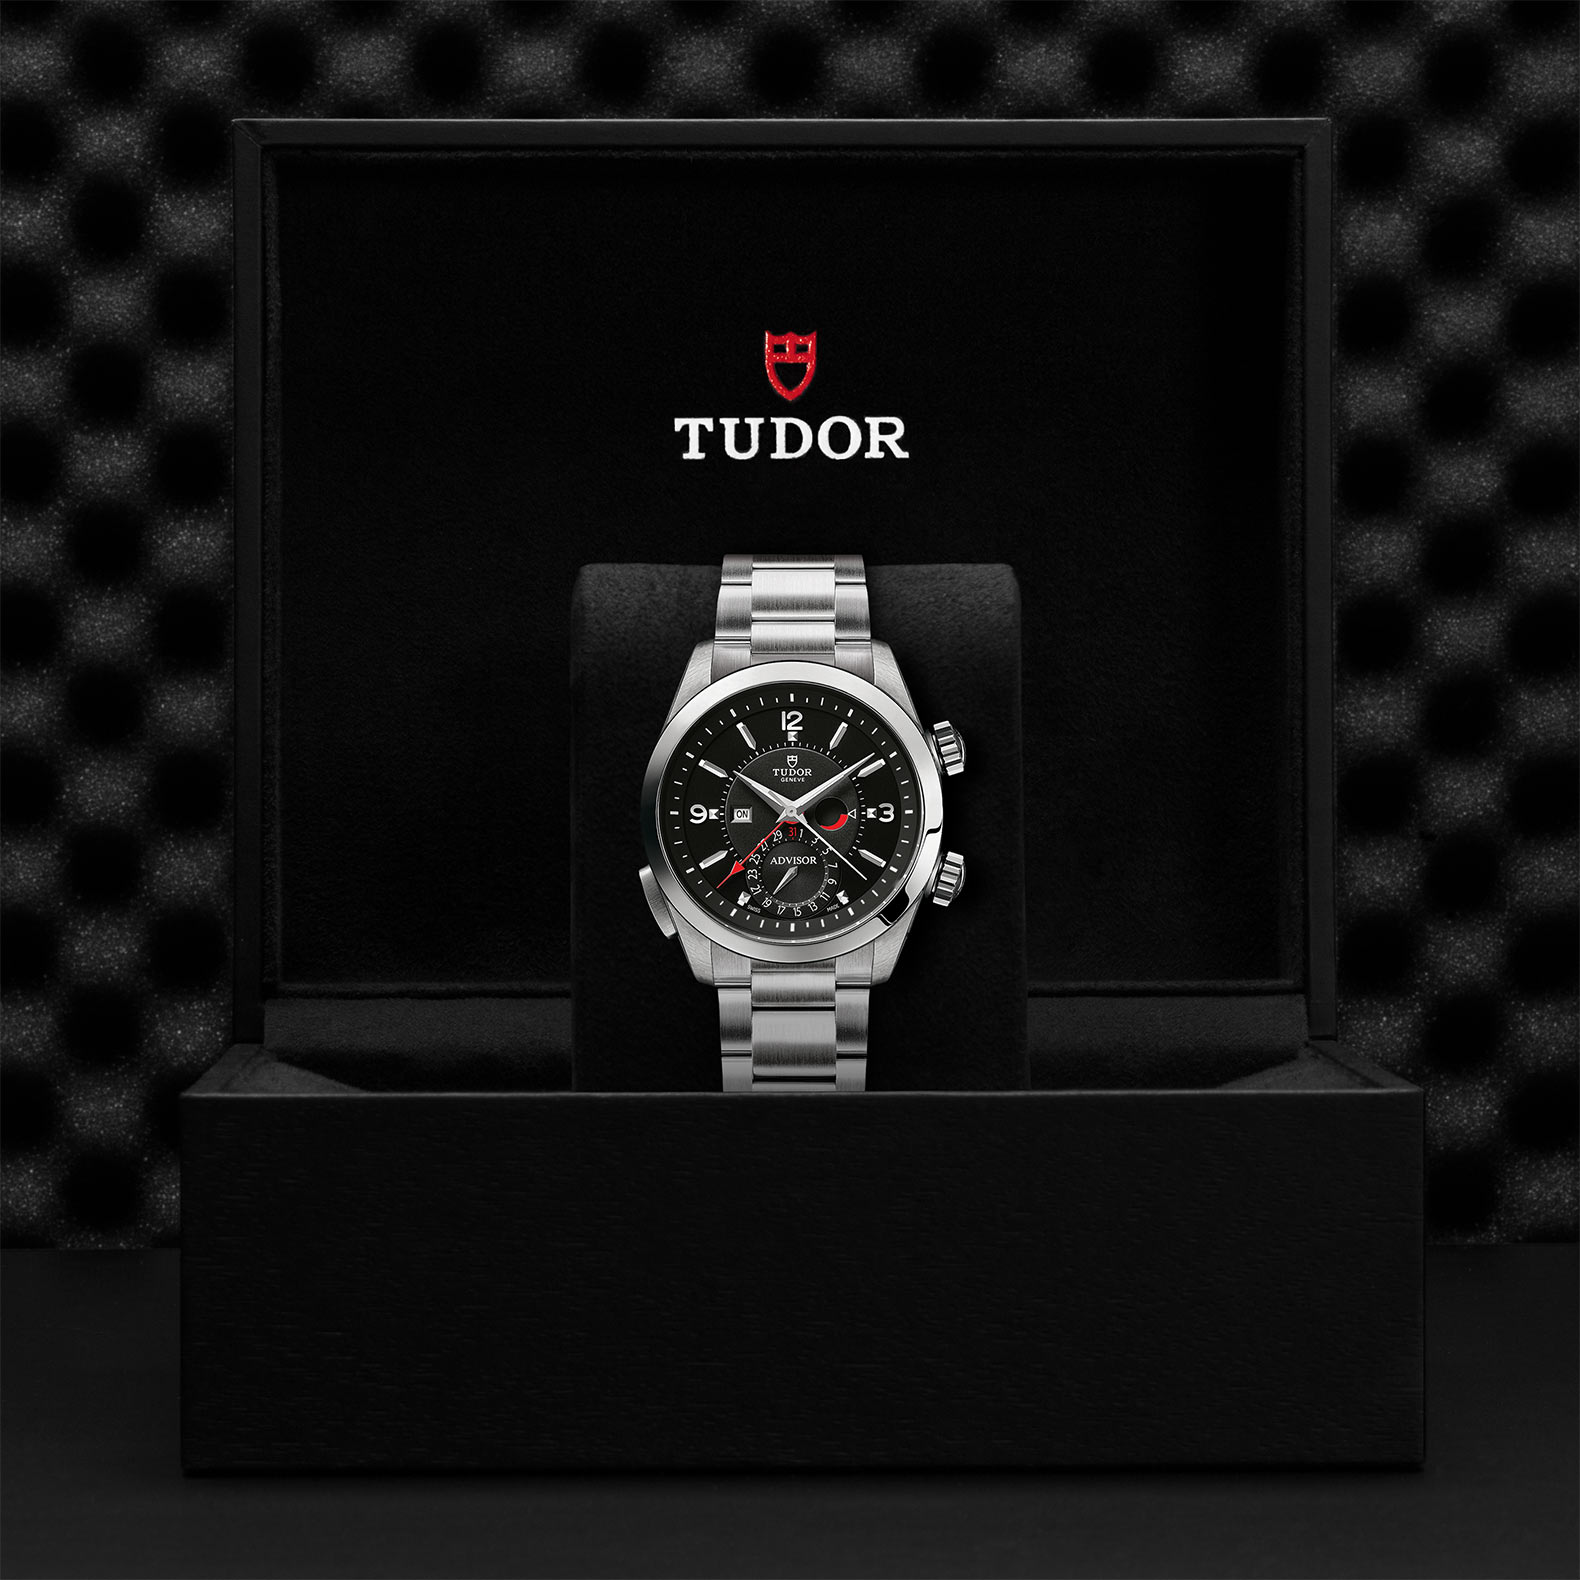 TUDOR Heritage Advisor - M79620TN-0005